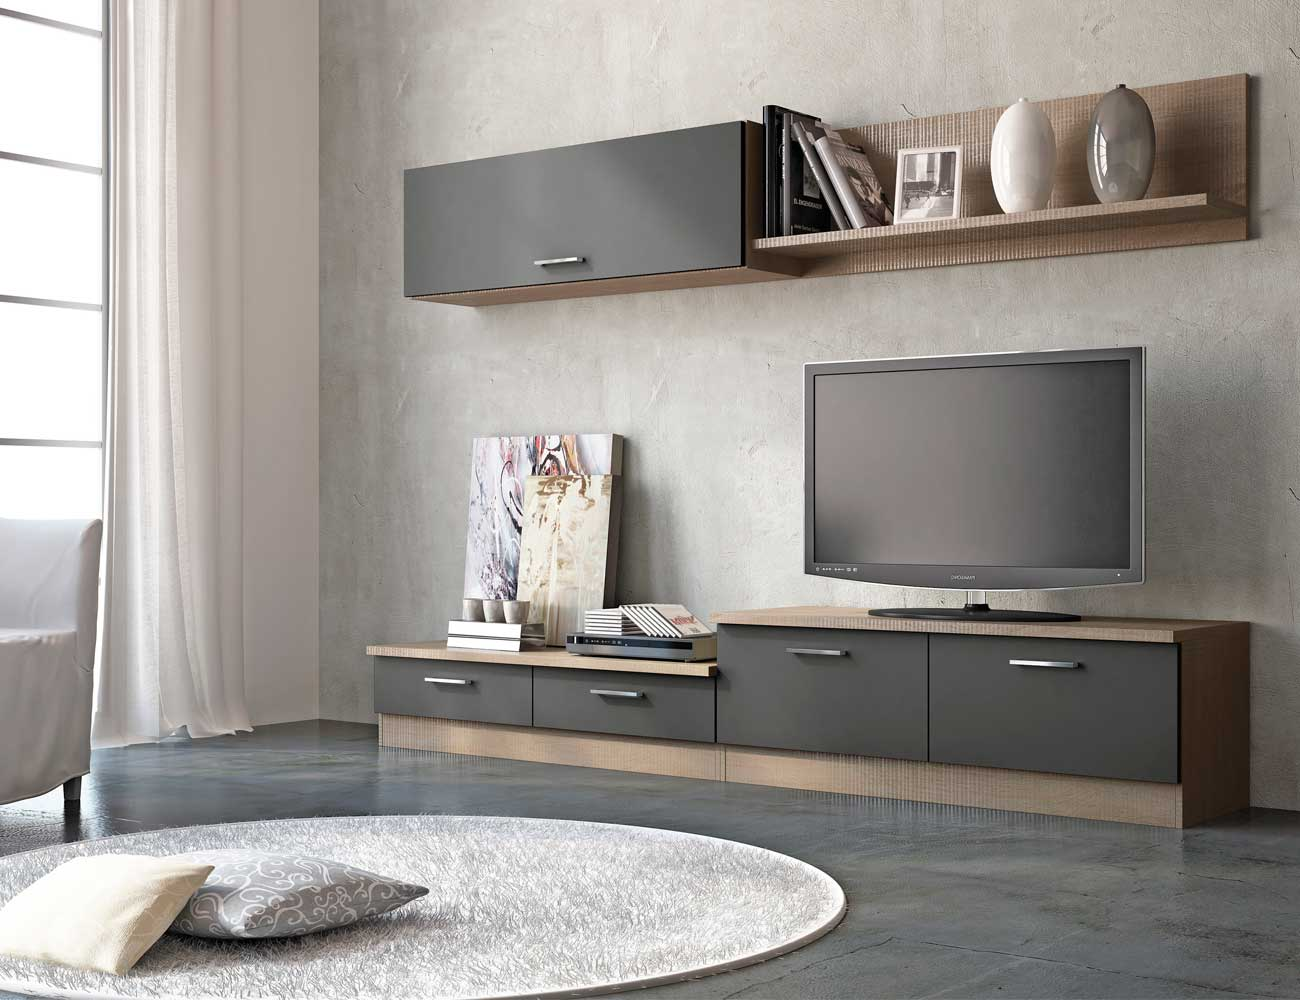 Mueble de sal n estilo moderno color cambrian grafito for Color cambrian muebles